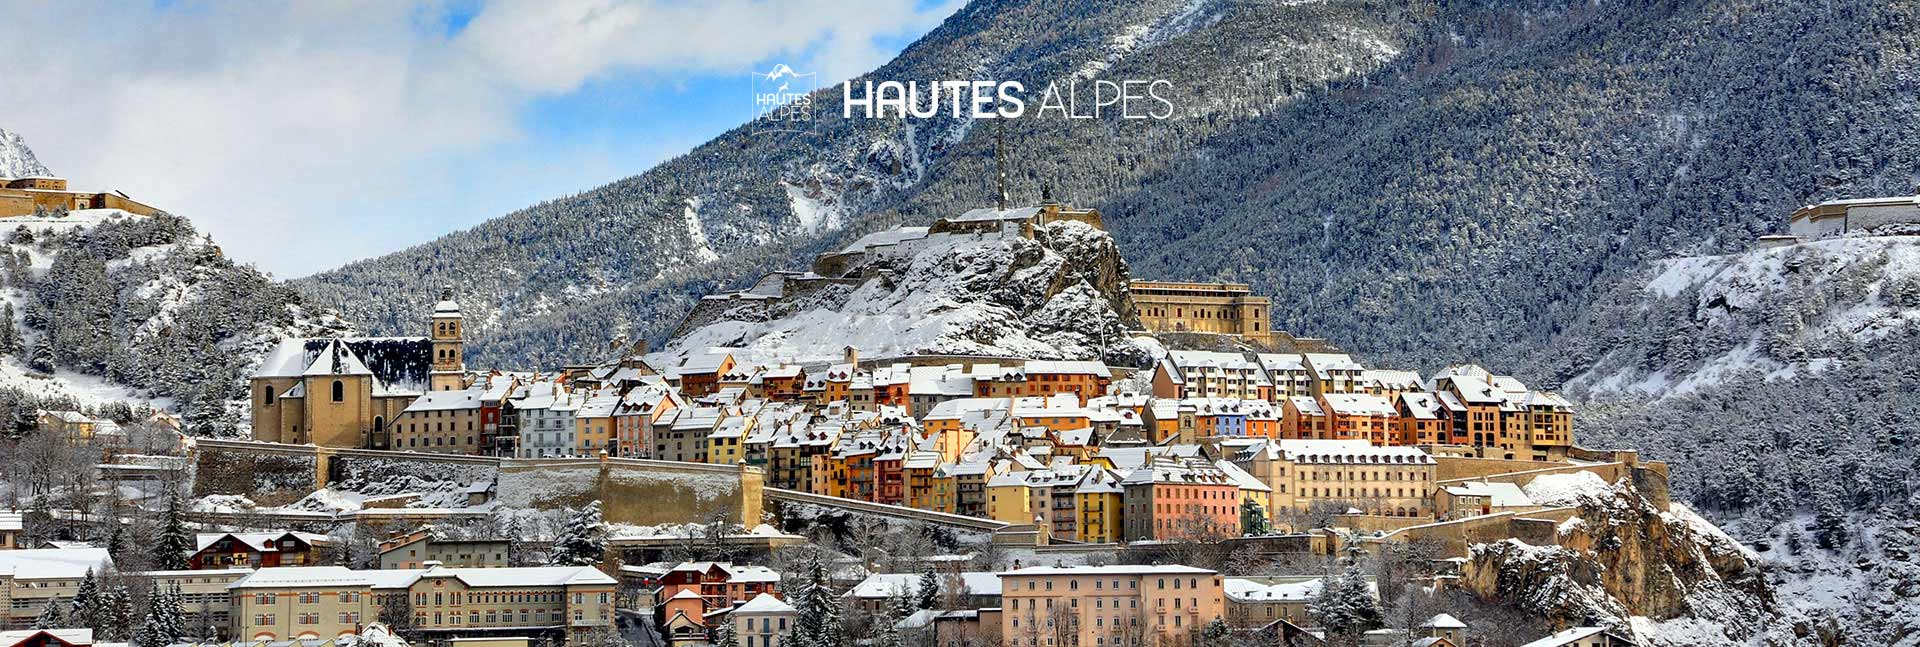 place libertin Hautes-Alpes